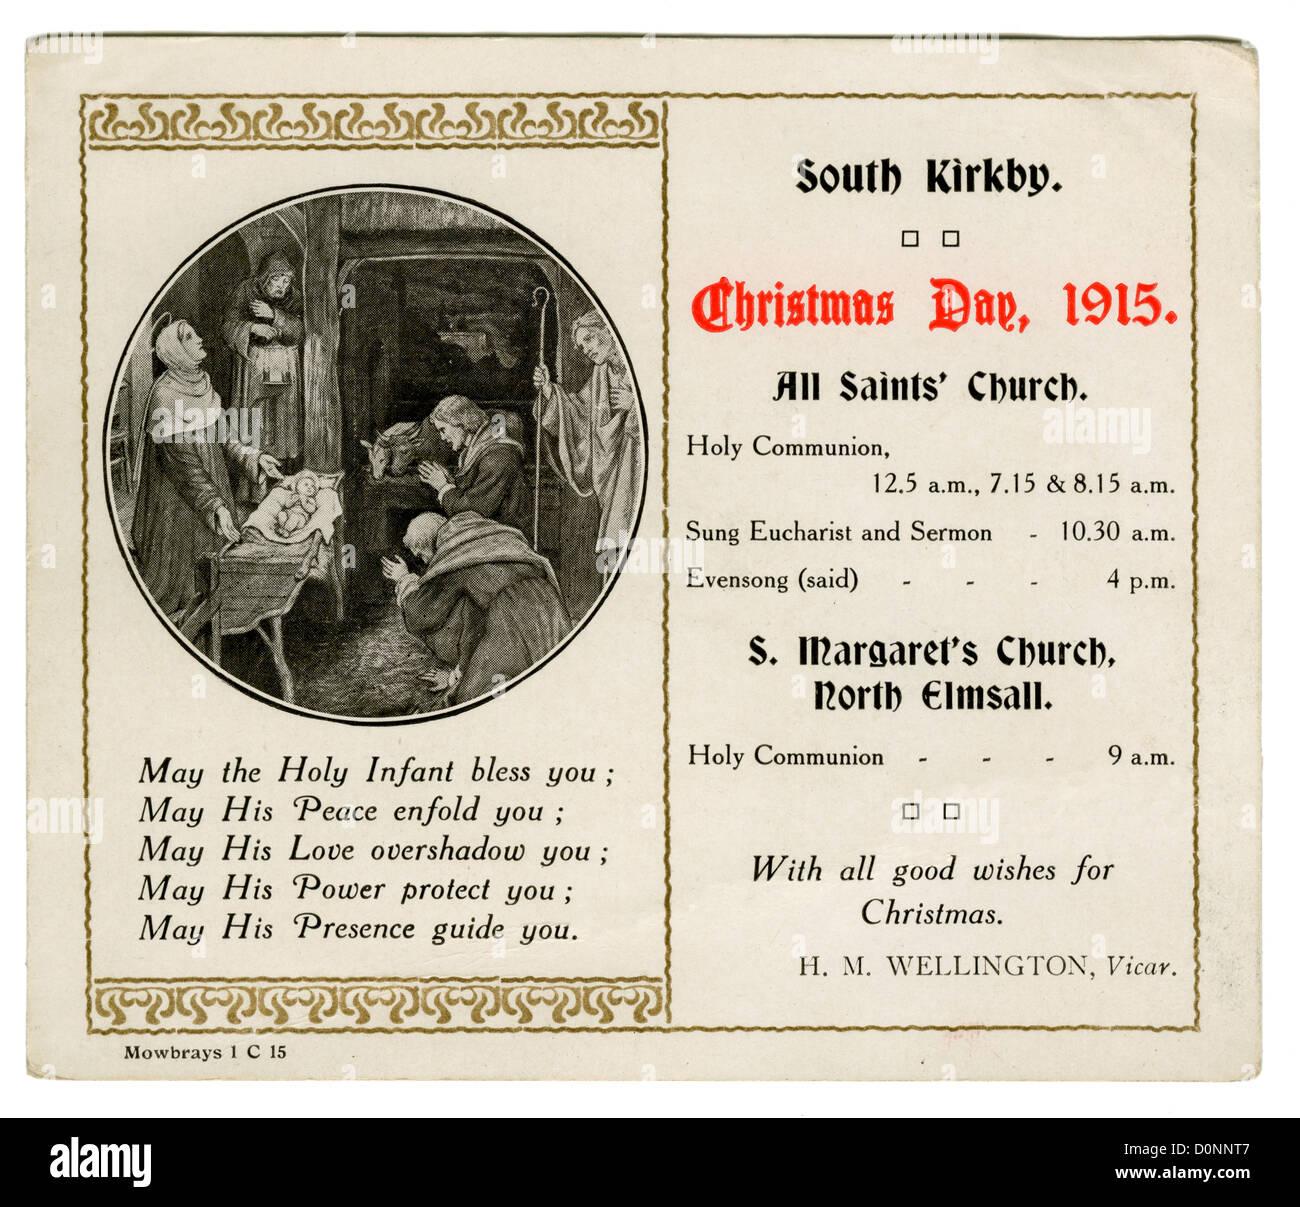 Wartime Christmas Stock Photos & Wartime Christmas Stock Images - Alamy